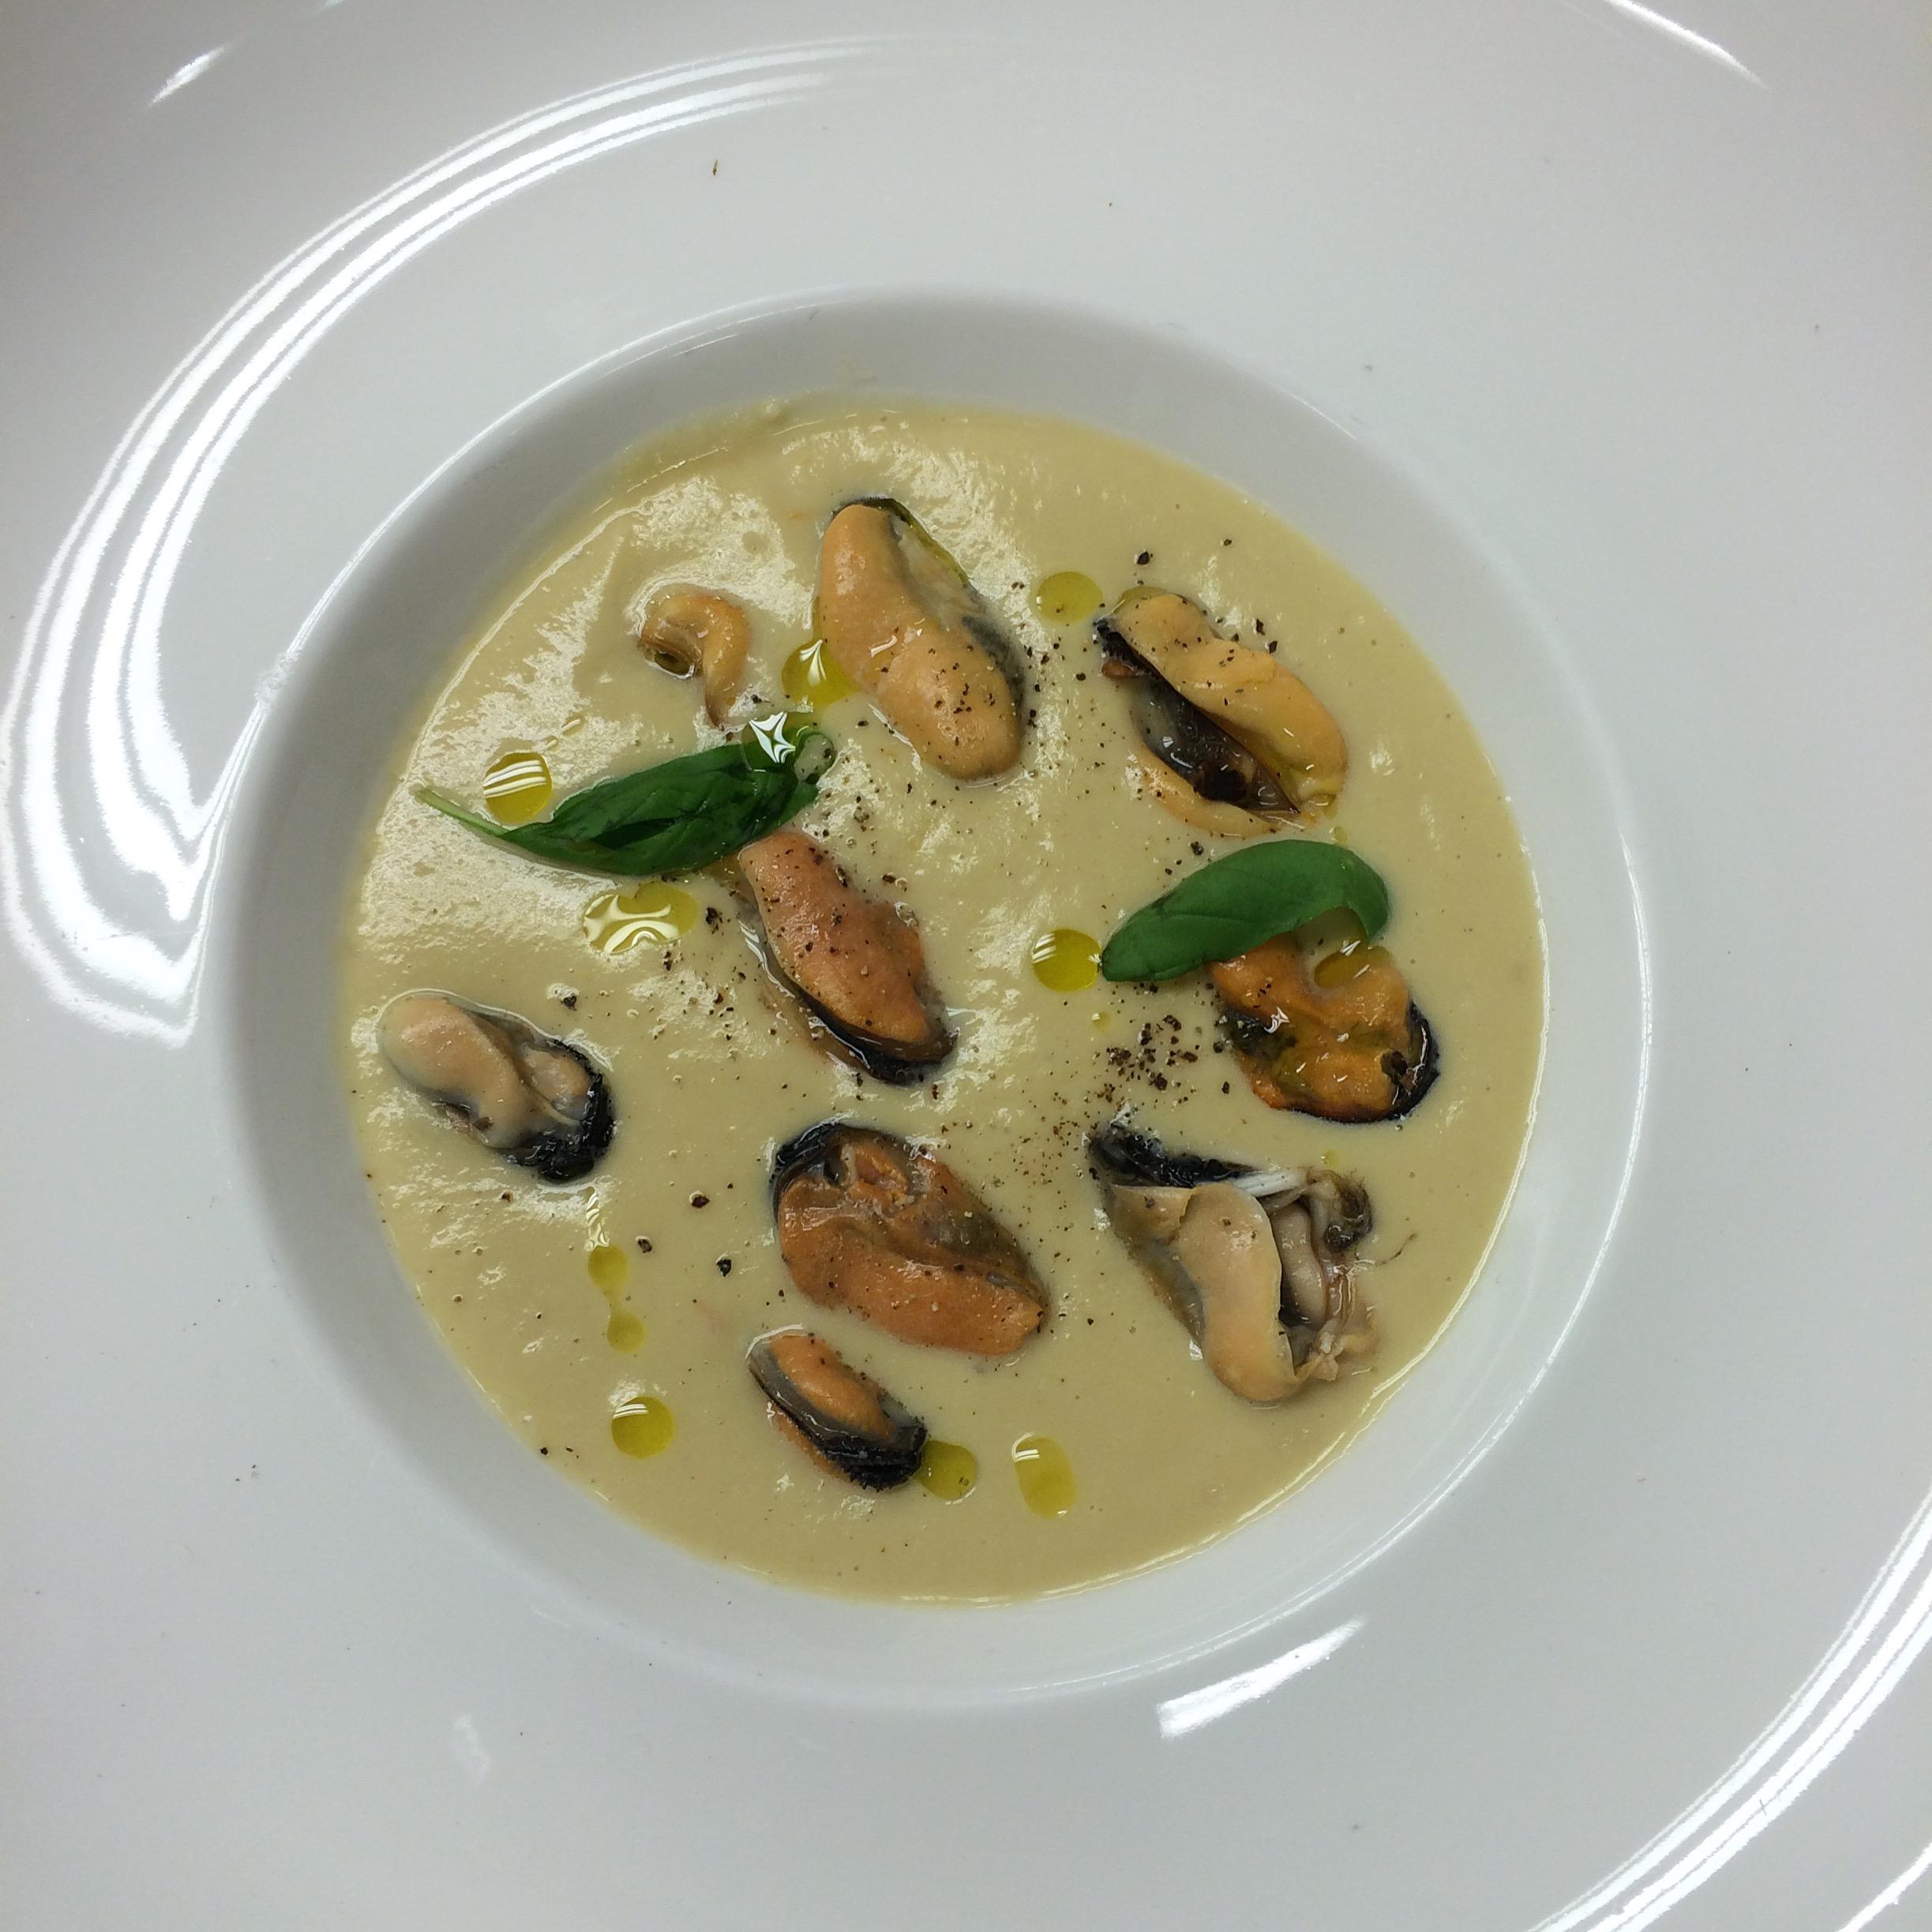 La cucina romana secondo nicola delfino secondome - Cucina gourmet ricette ...